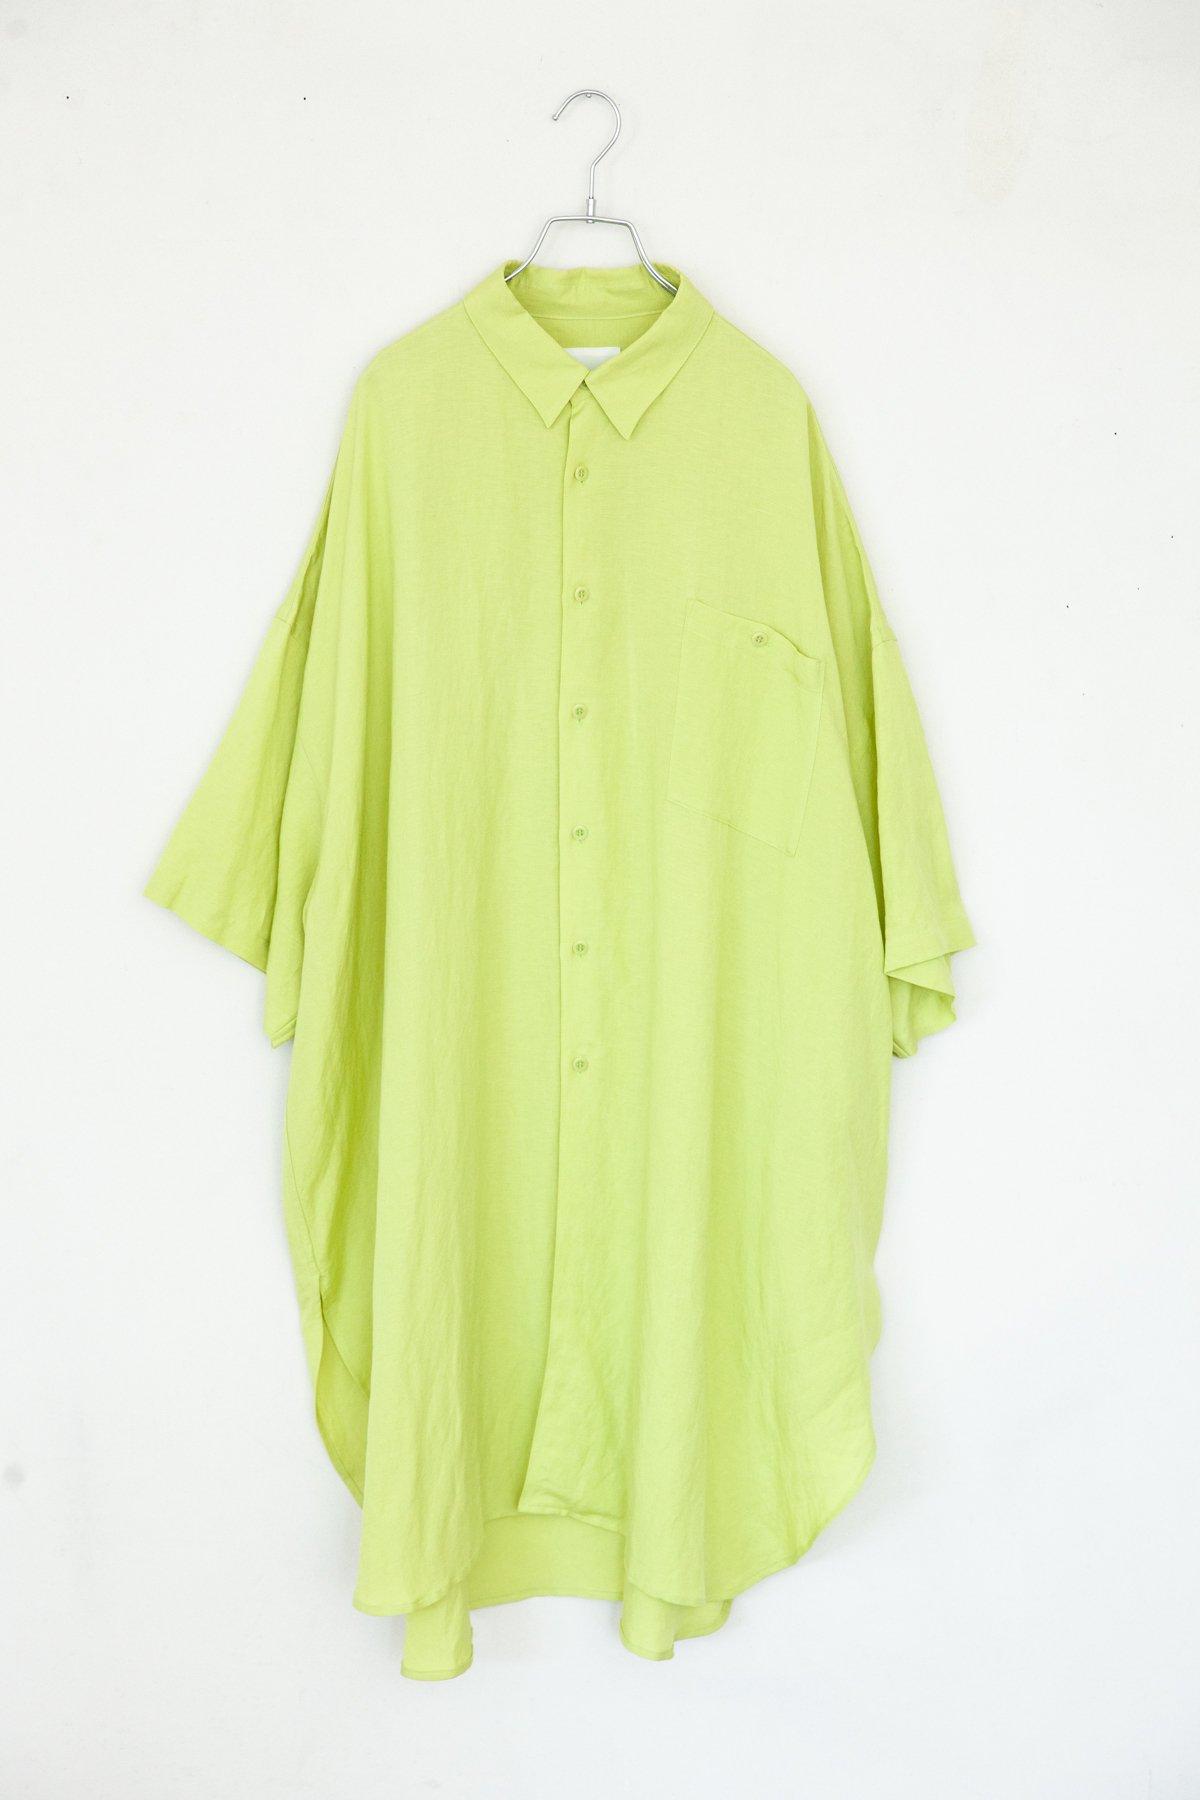 whowhat / 5X SHIRT (SHORT/LONG) LIME GREEN